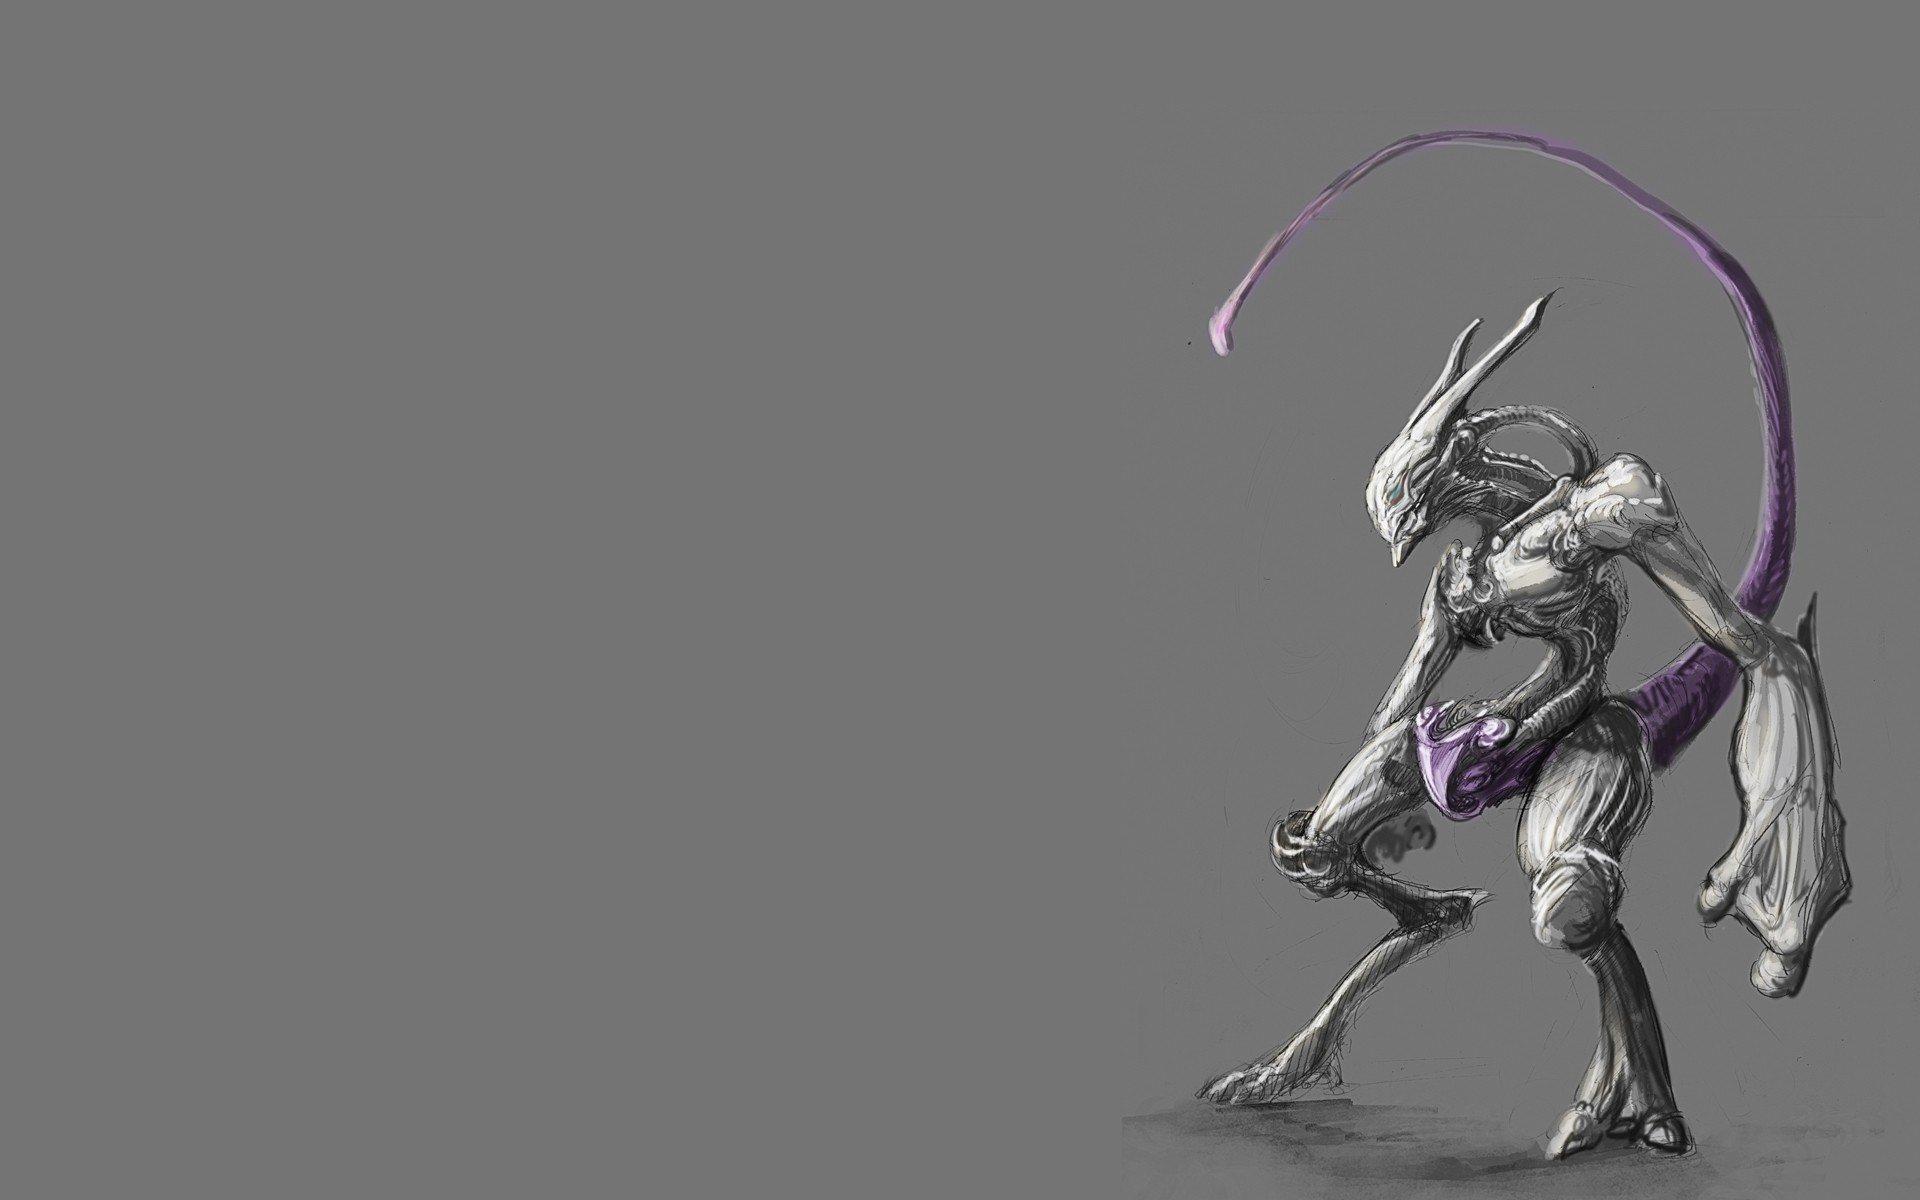 Pokemon, Mewtwo, Simple background Wallpaper